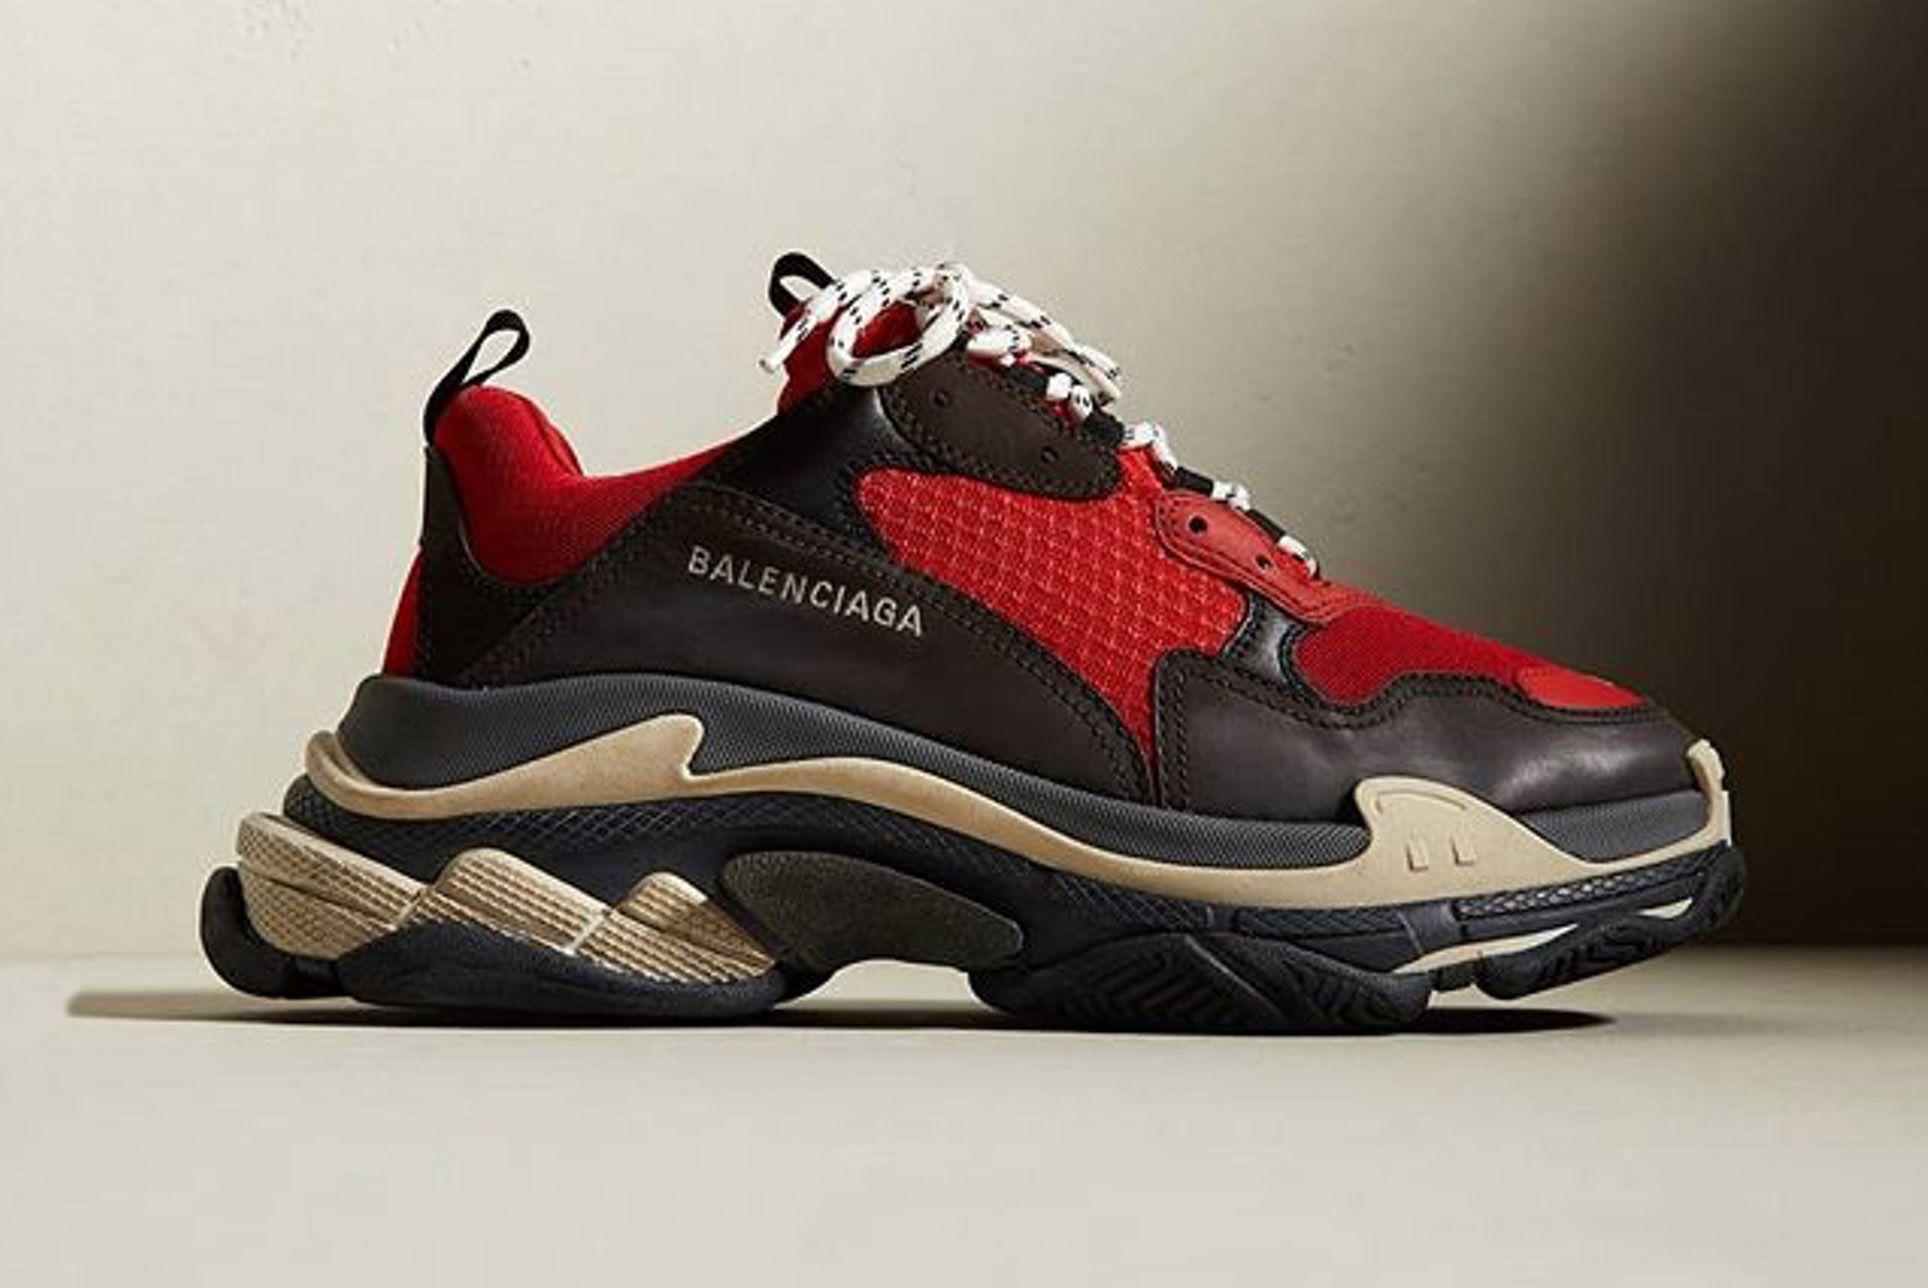 Balenciaga Triple S Bred 1 Sneaker Freaker